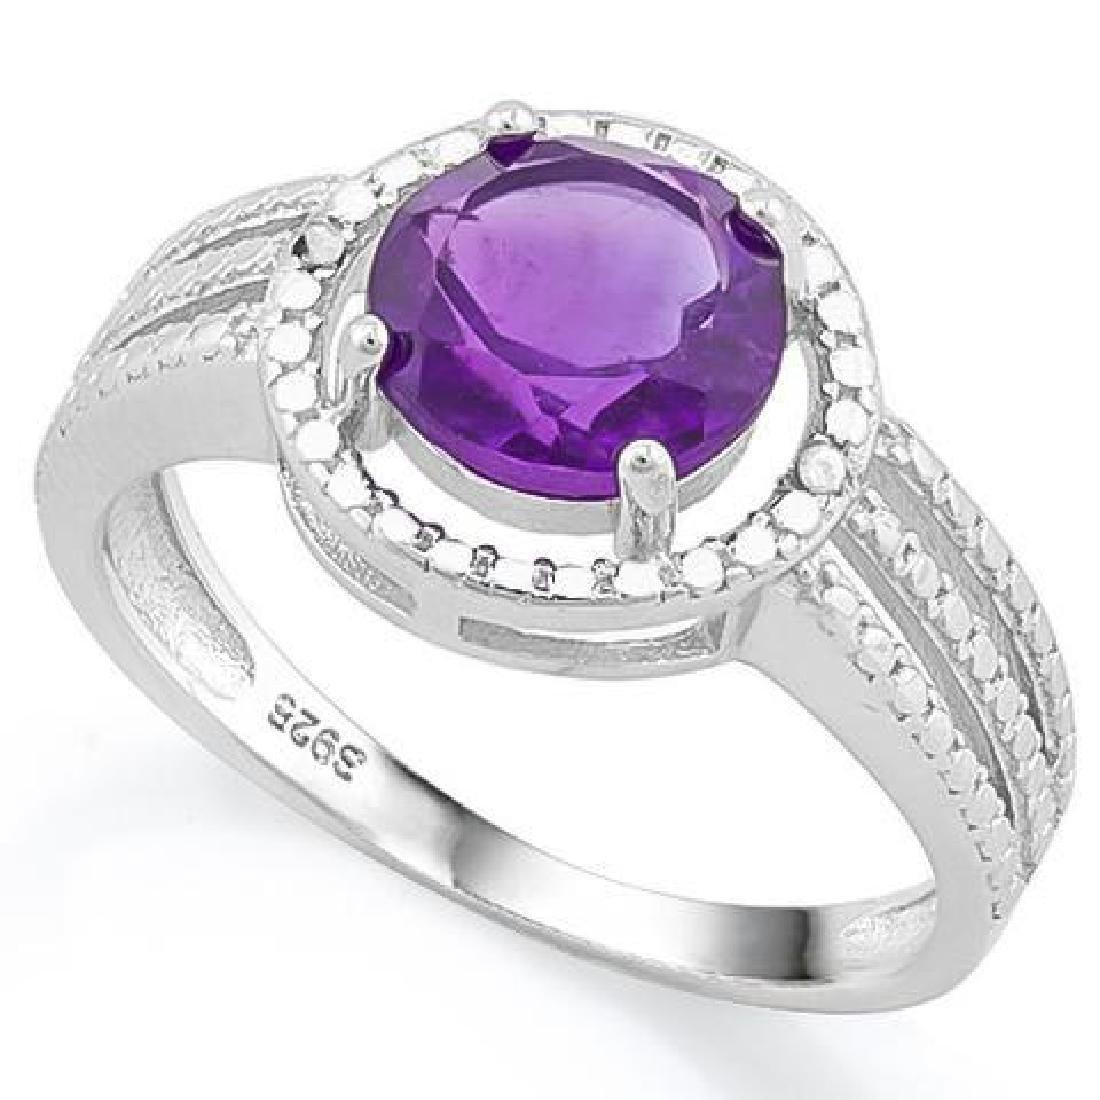 1 4/5 CARAT AMETHYST  DIAMOND 925 STERLING SILVER RING